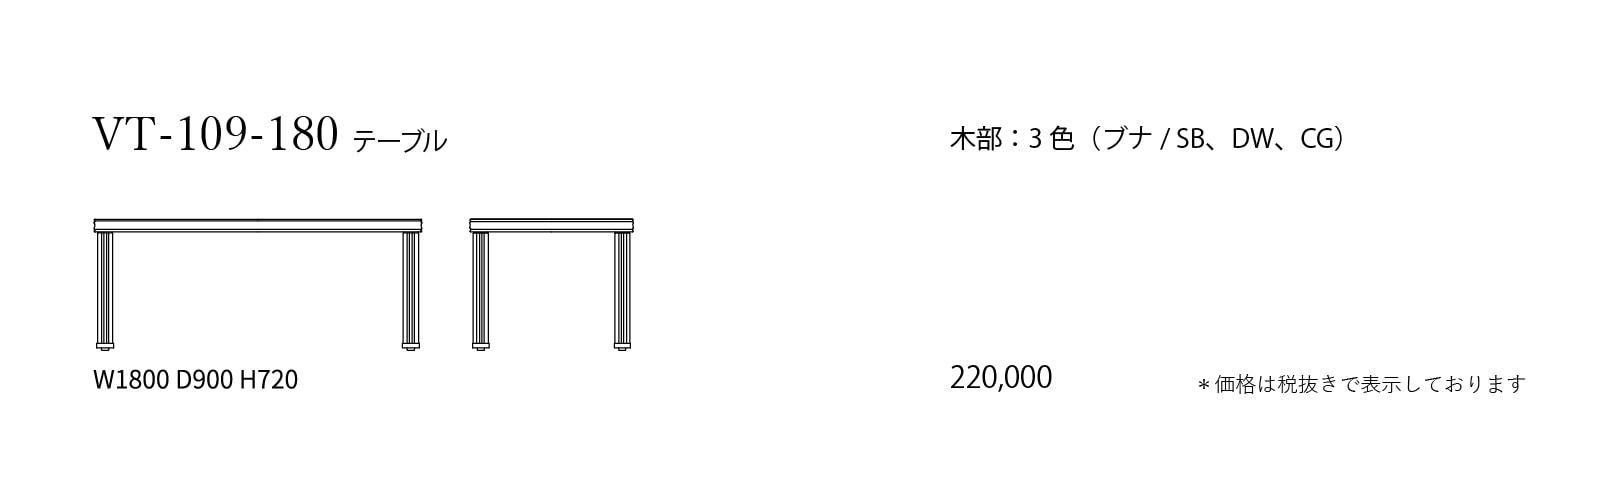 VT-109 Price List